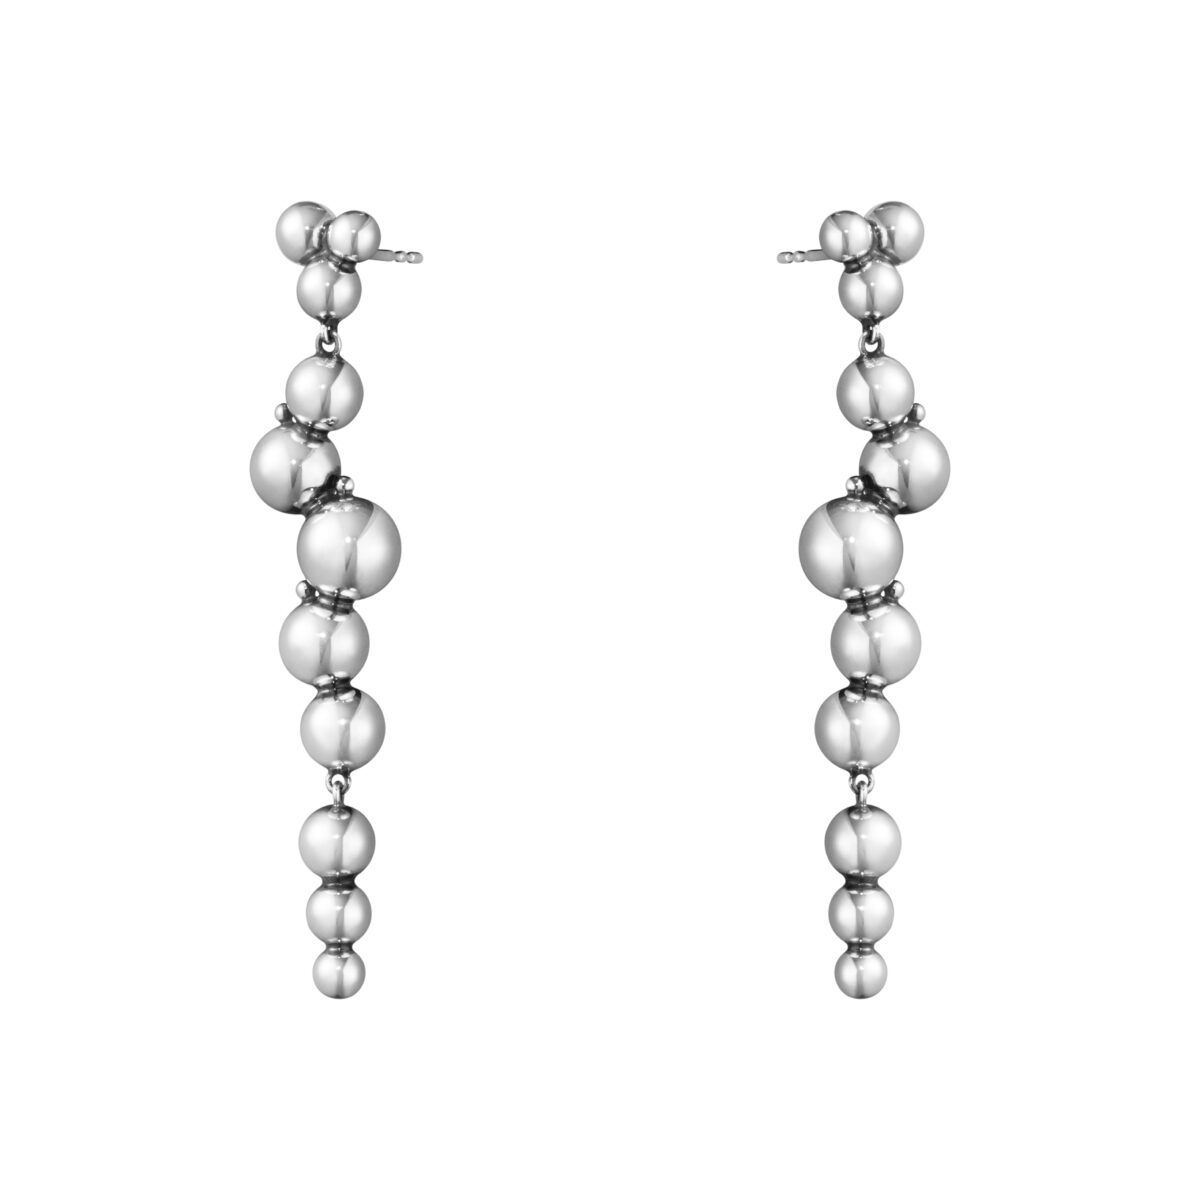 Moonlight Grapes Sterling Sliver Drop Earrings